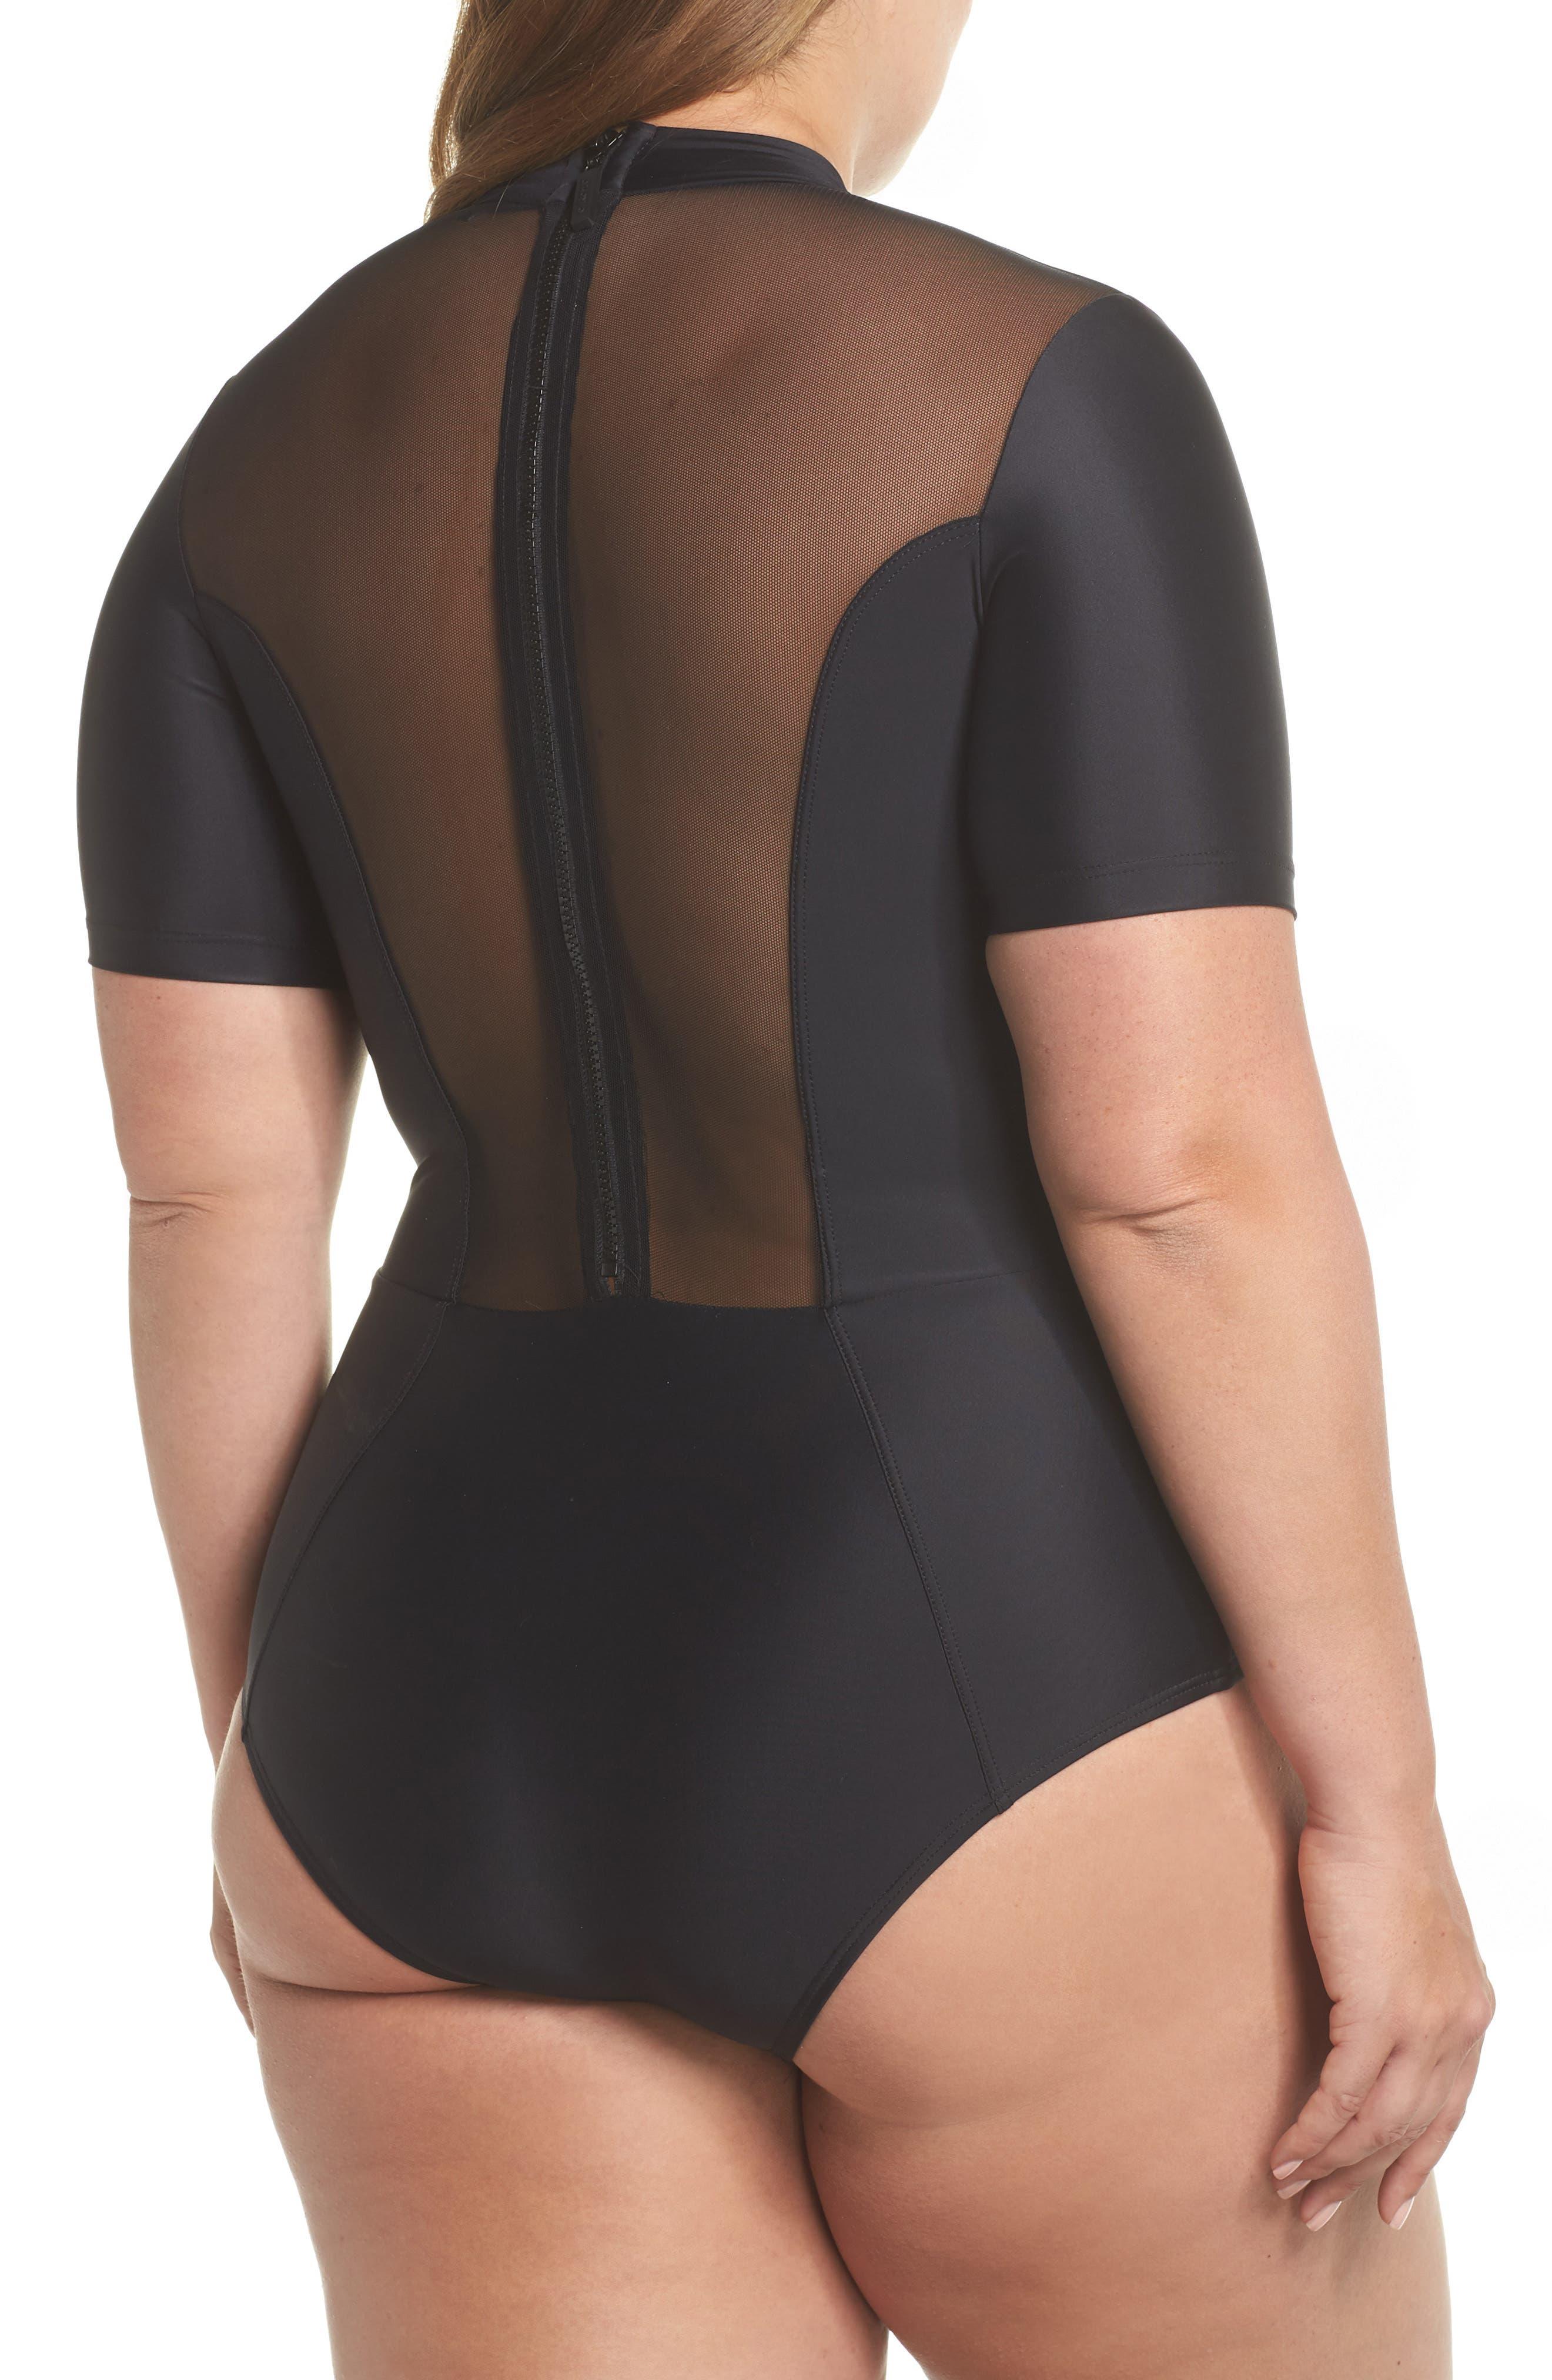 Tidal Back Zip One-Piece Swimsuit,                             Alternate thumbnail 2, color,                             Black